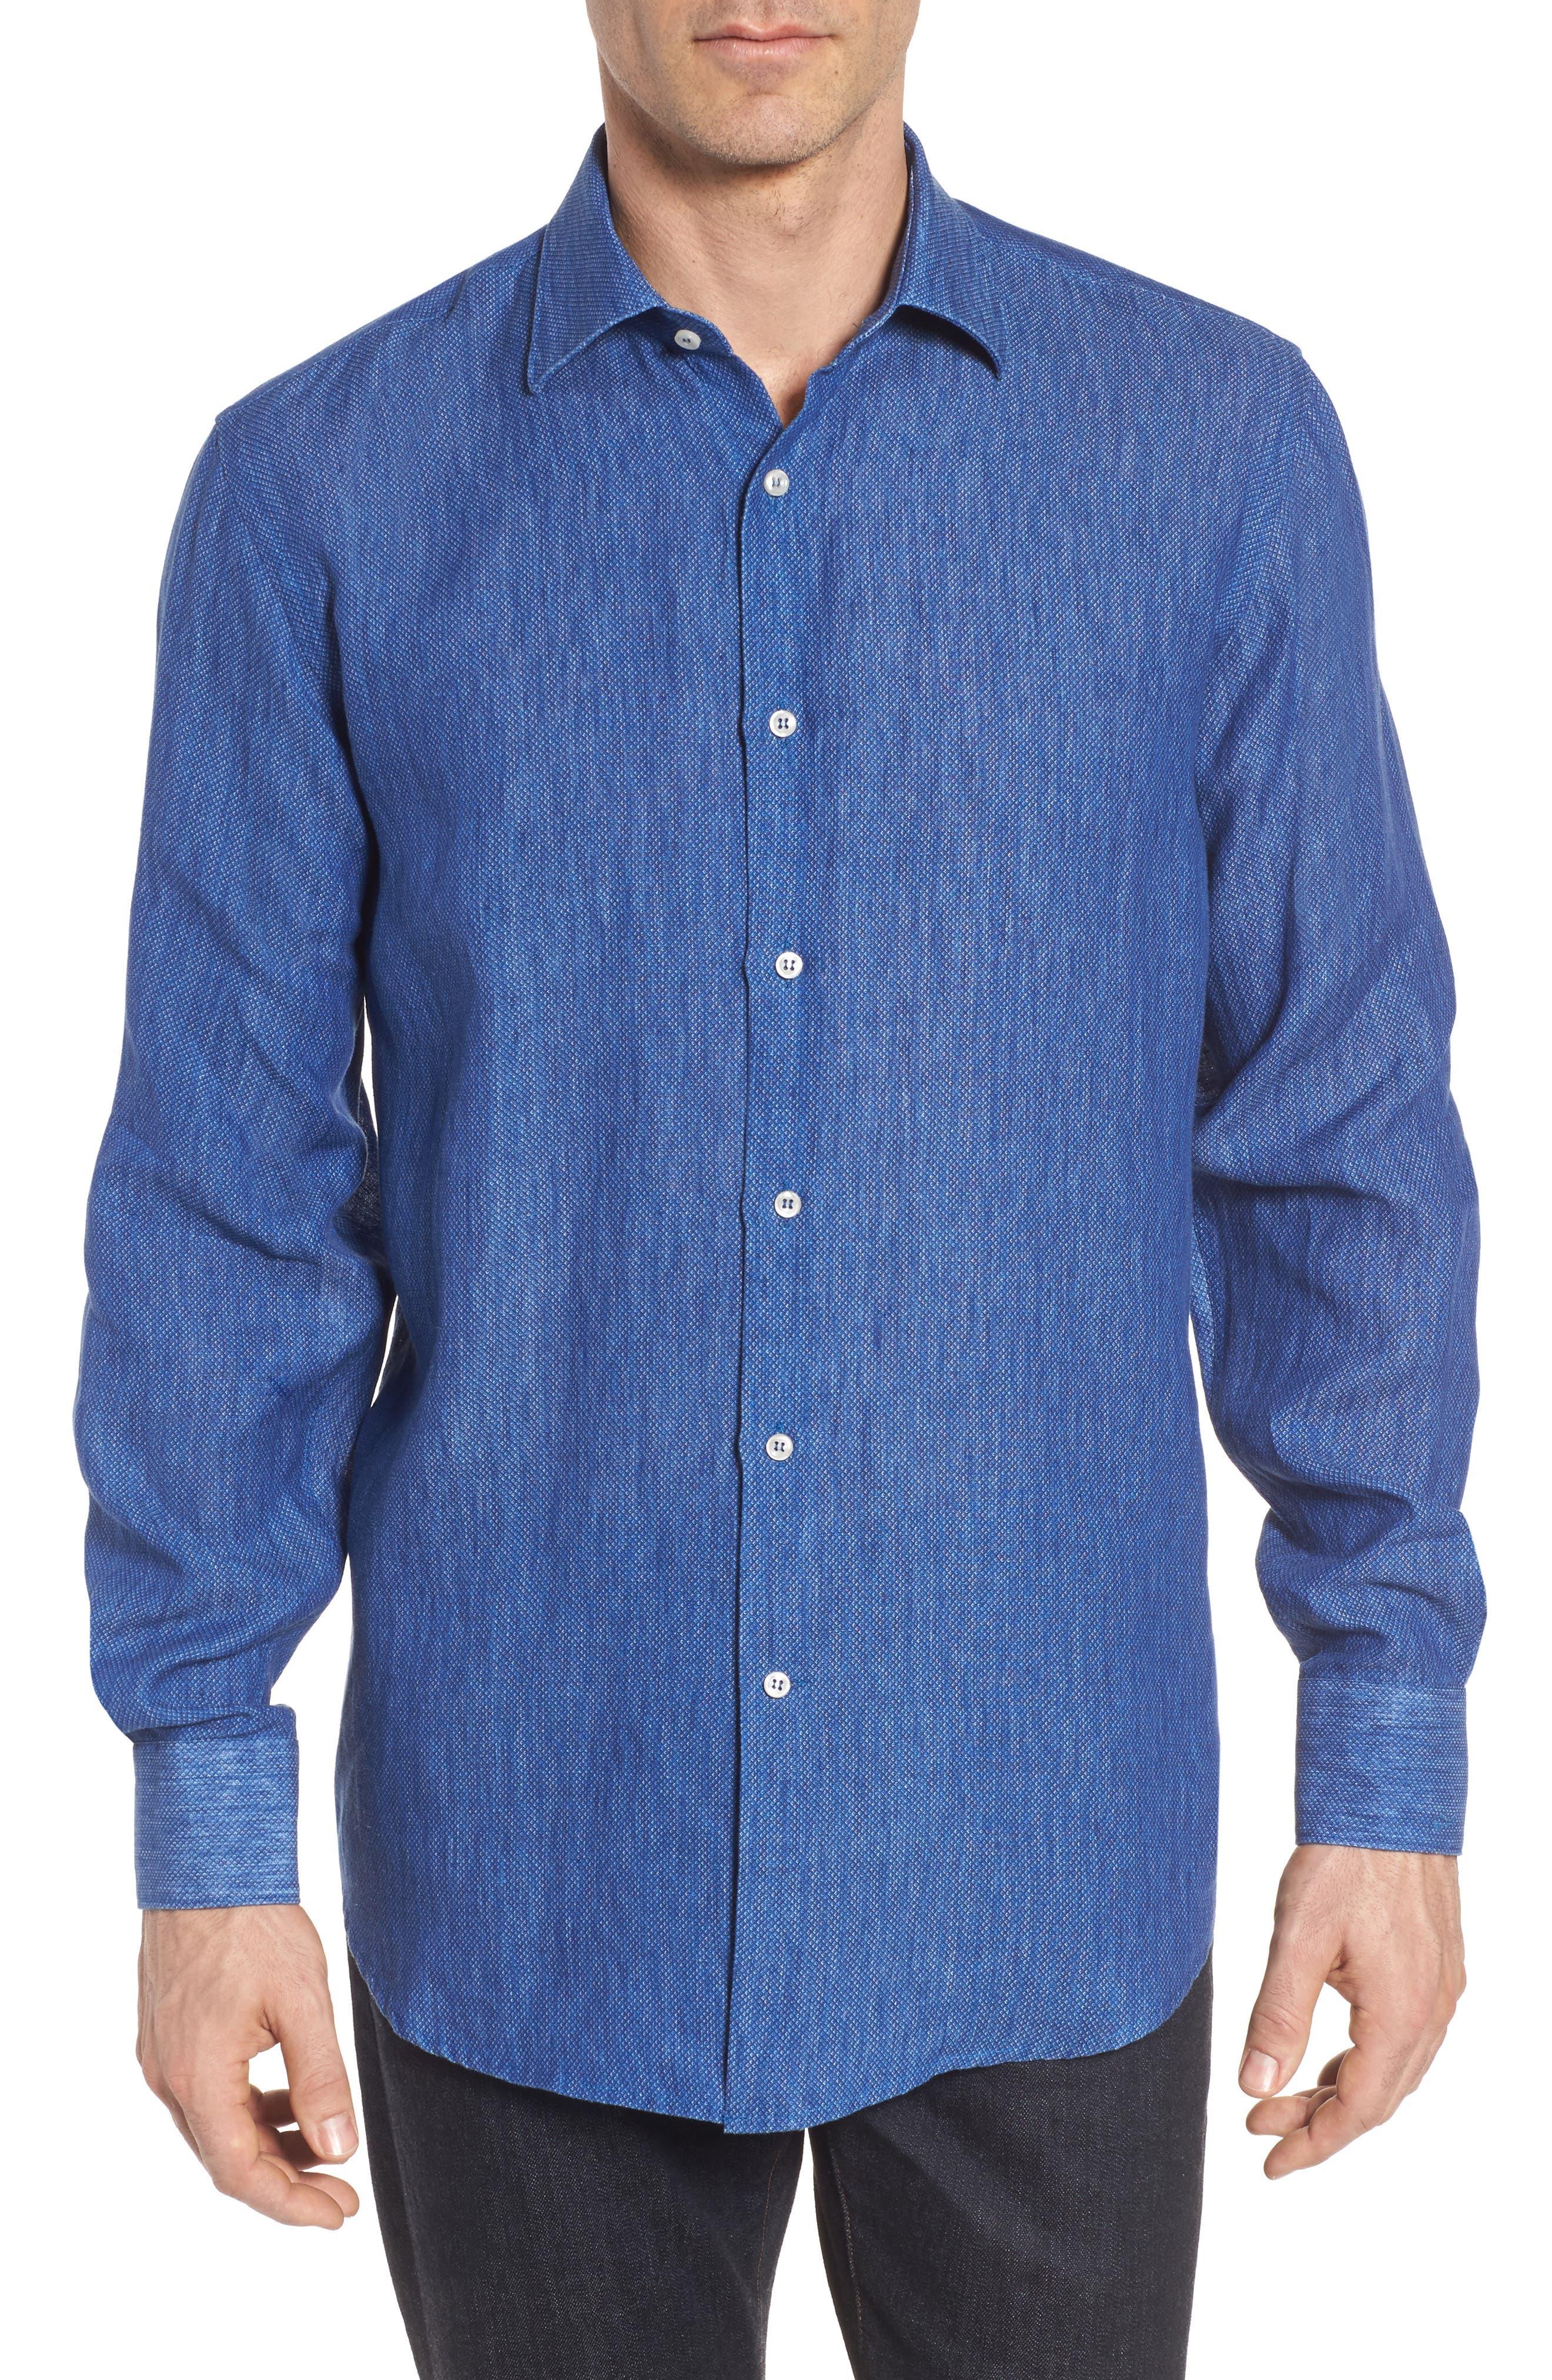 Paul&Shark Regular Fit Piqué Sport Shirt,                             Main thumbnail 1, color,                             Blue